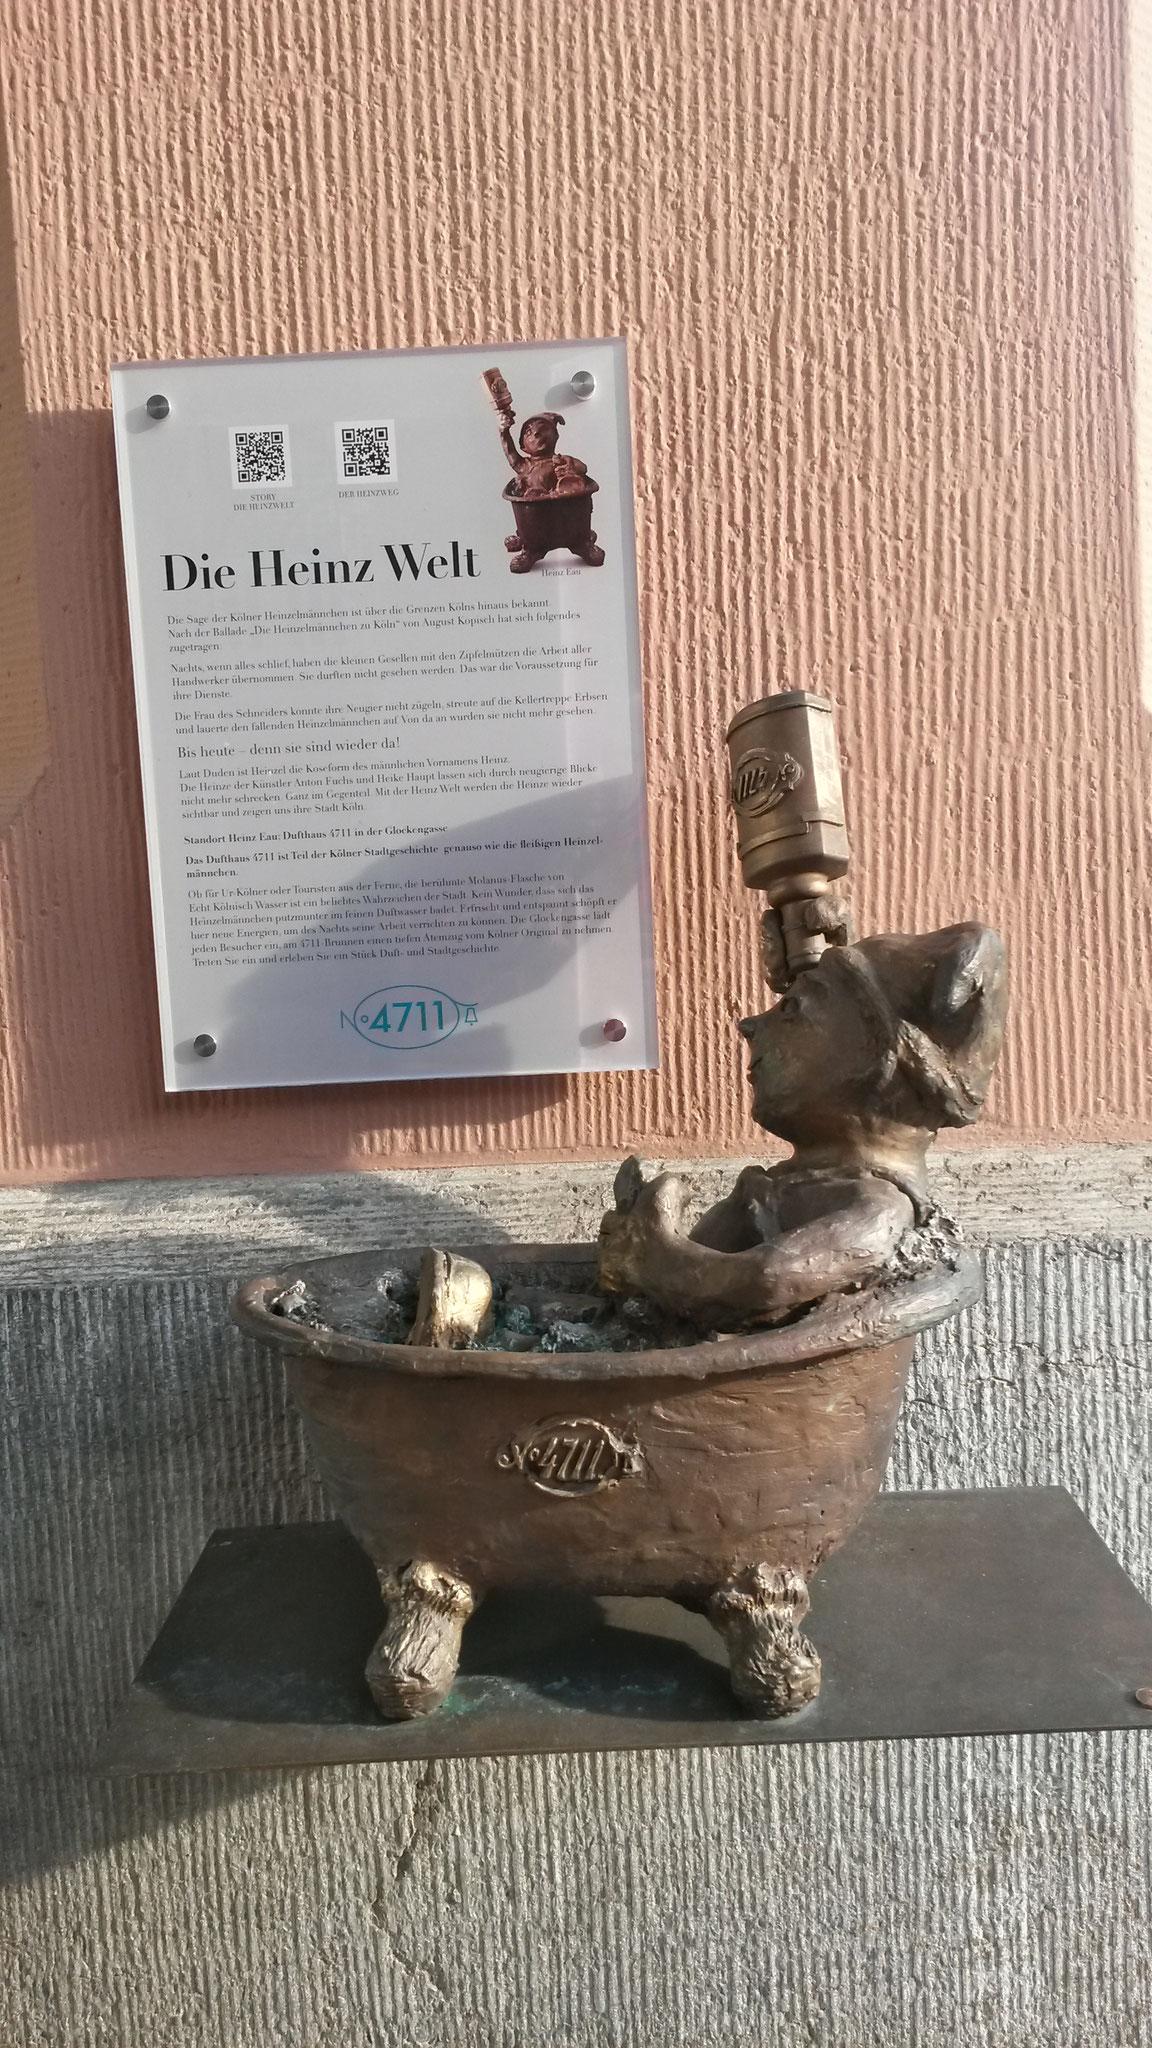 Heinzelmännchen Short Story/ Duftwasserbrunnen im Winter abgestellt.